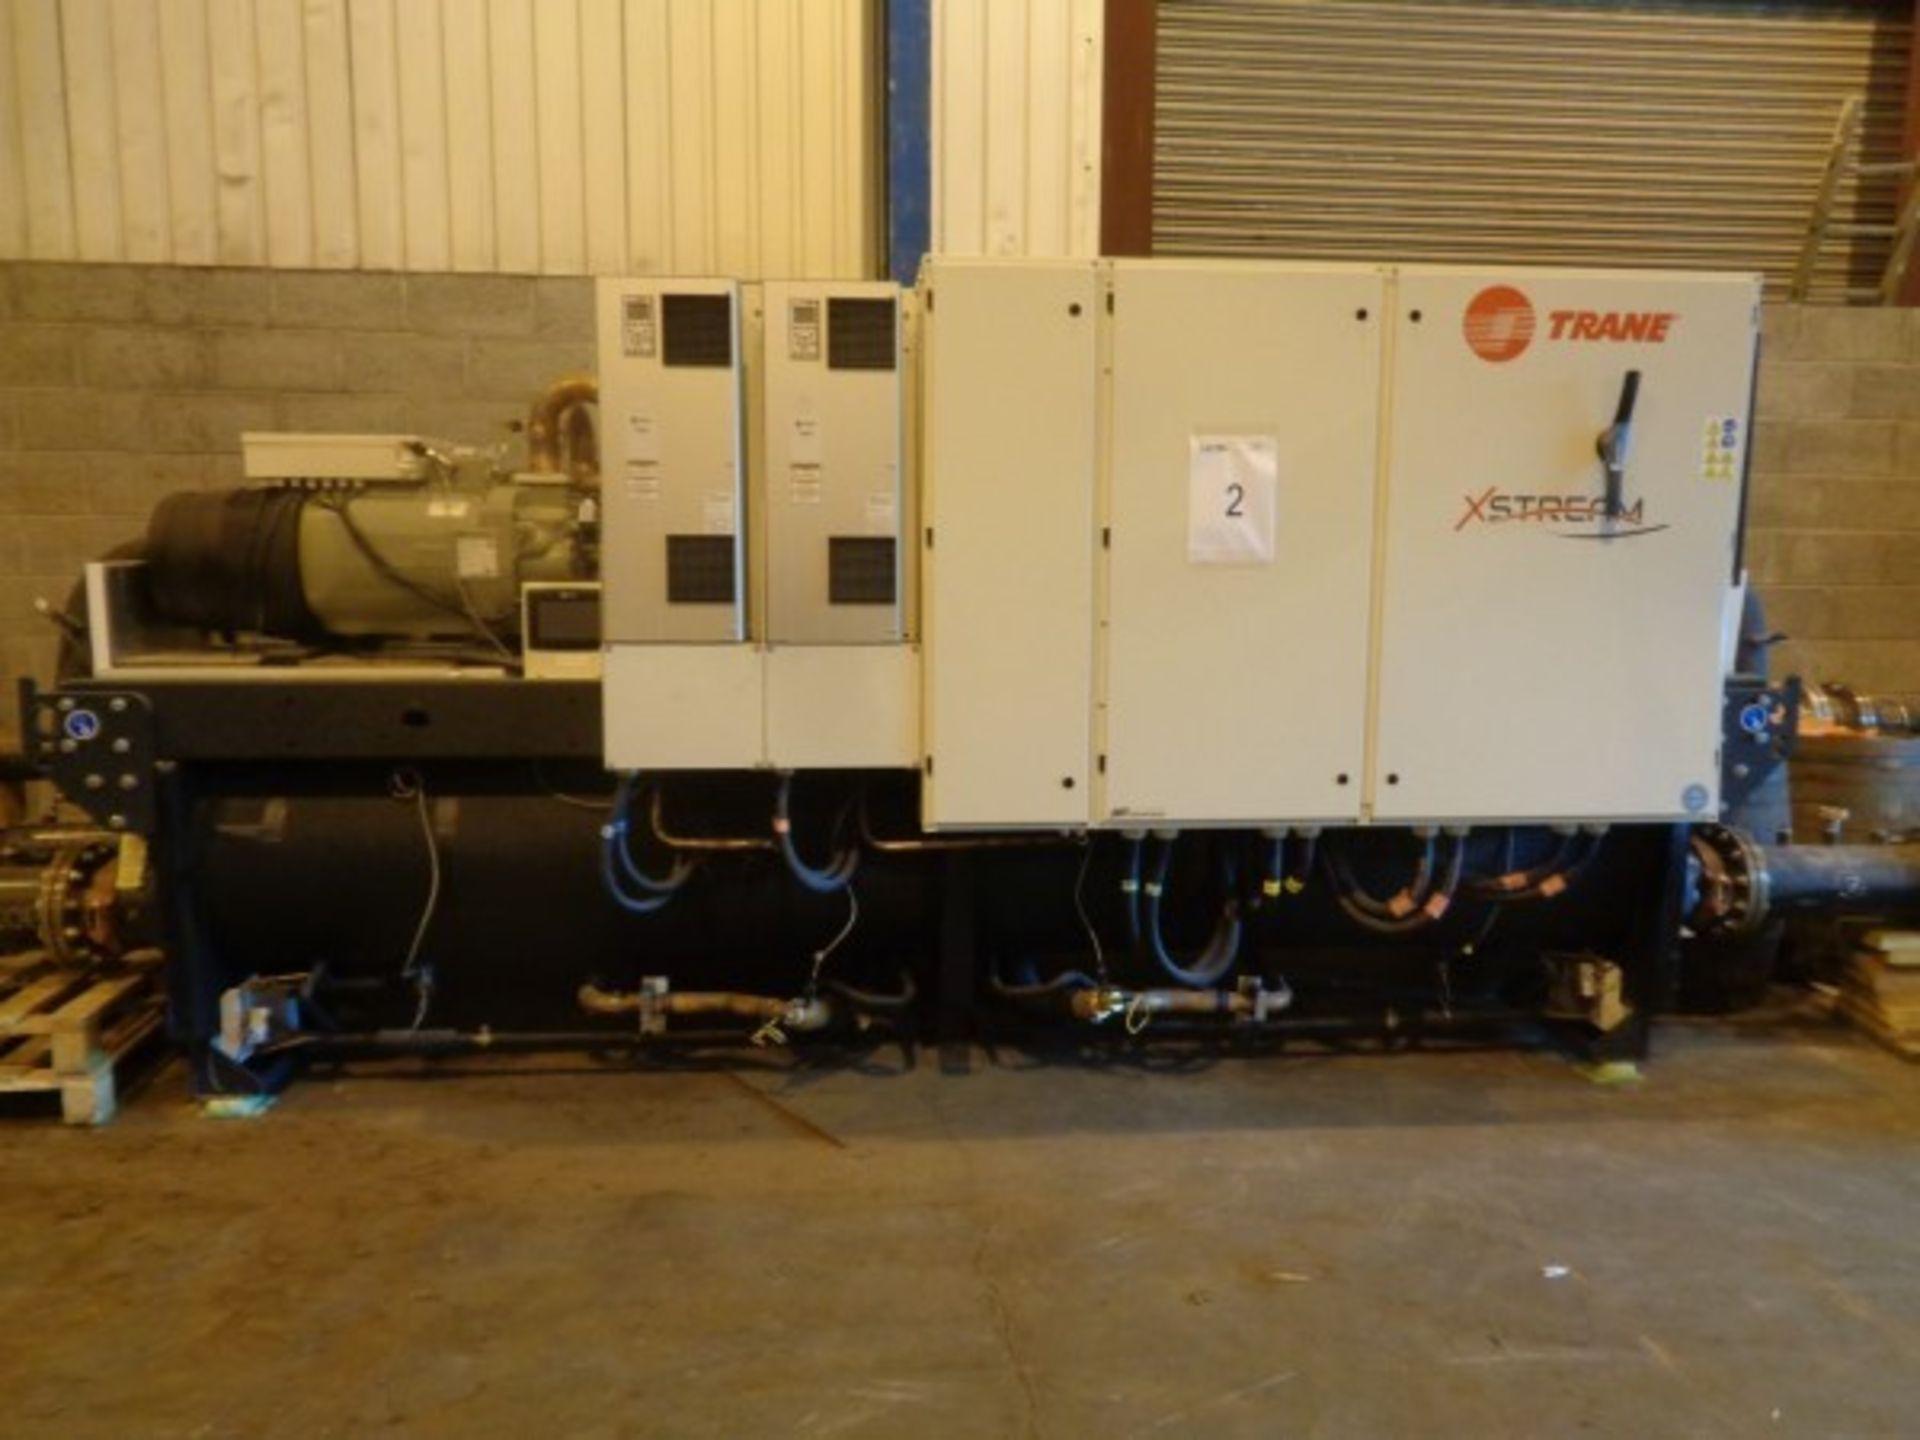 Trane Type RTWF 360HSE heat pump, serial no. ELB6033, 400V-50 HZ-3PH, 928 A Maz, 35KA-ICC-LRA,